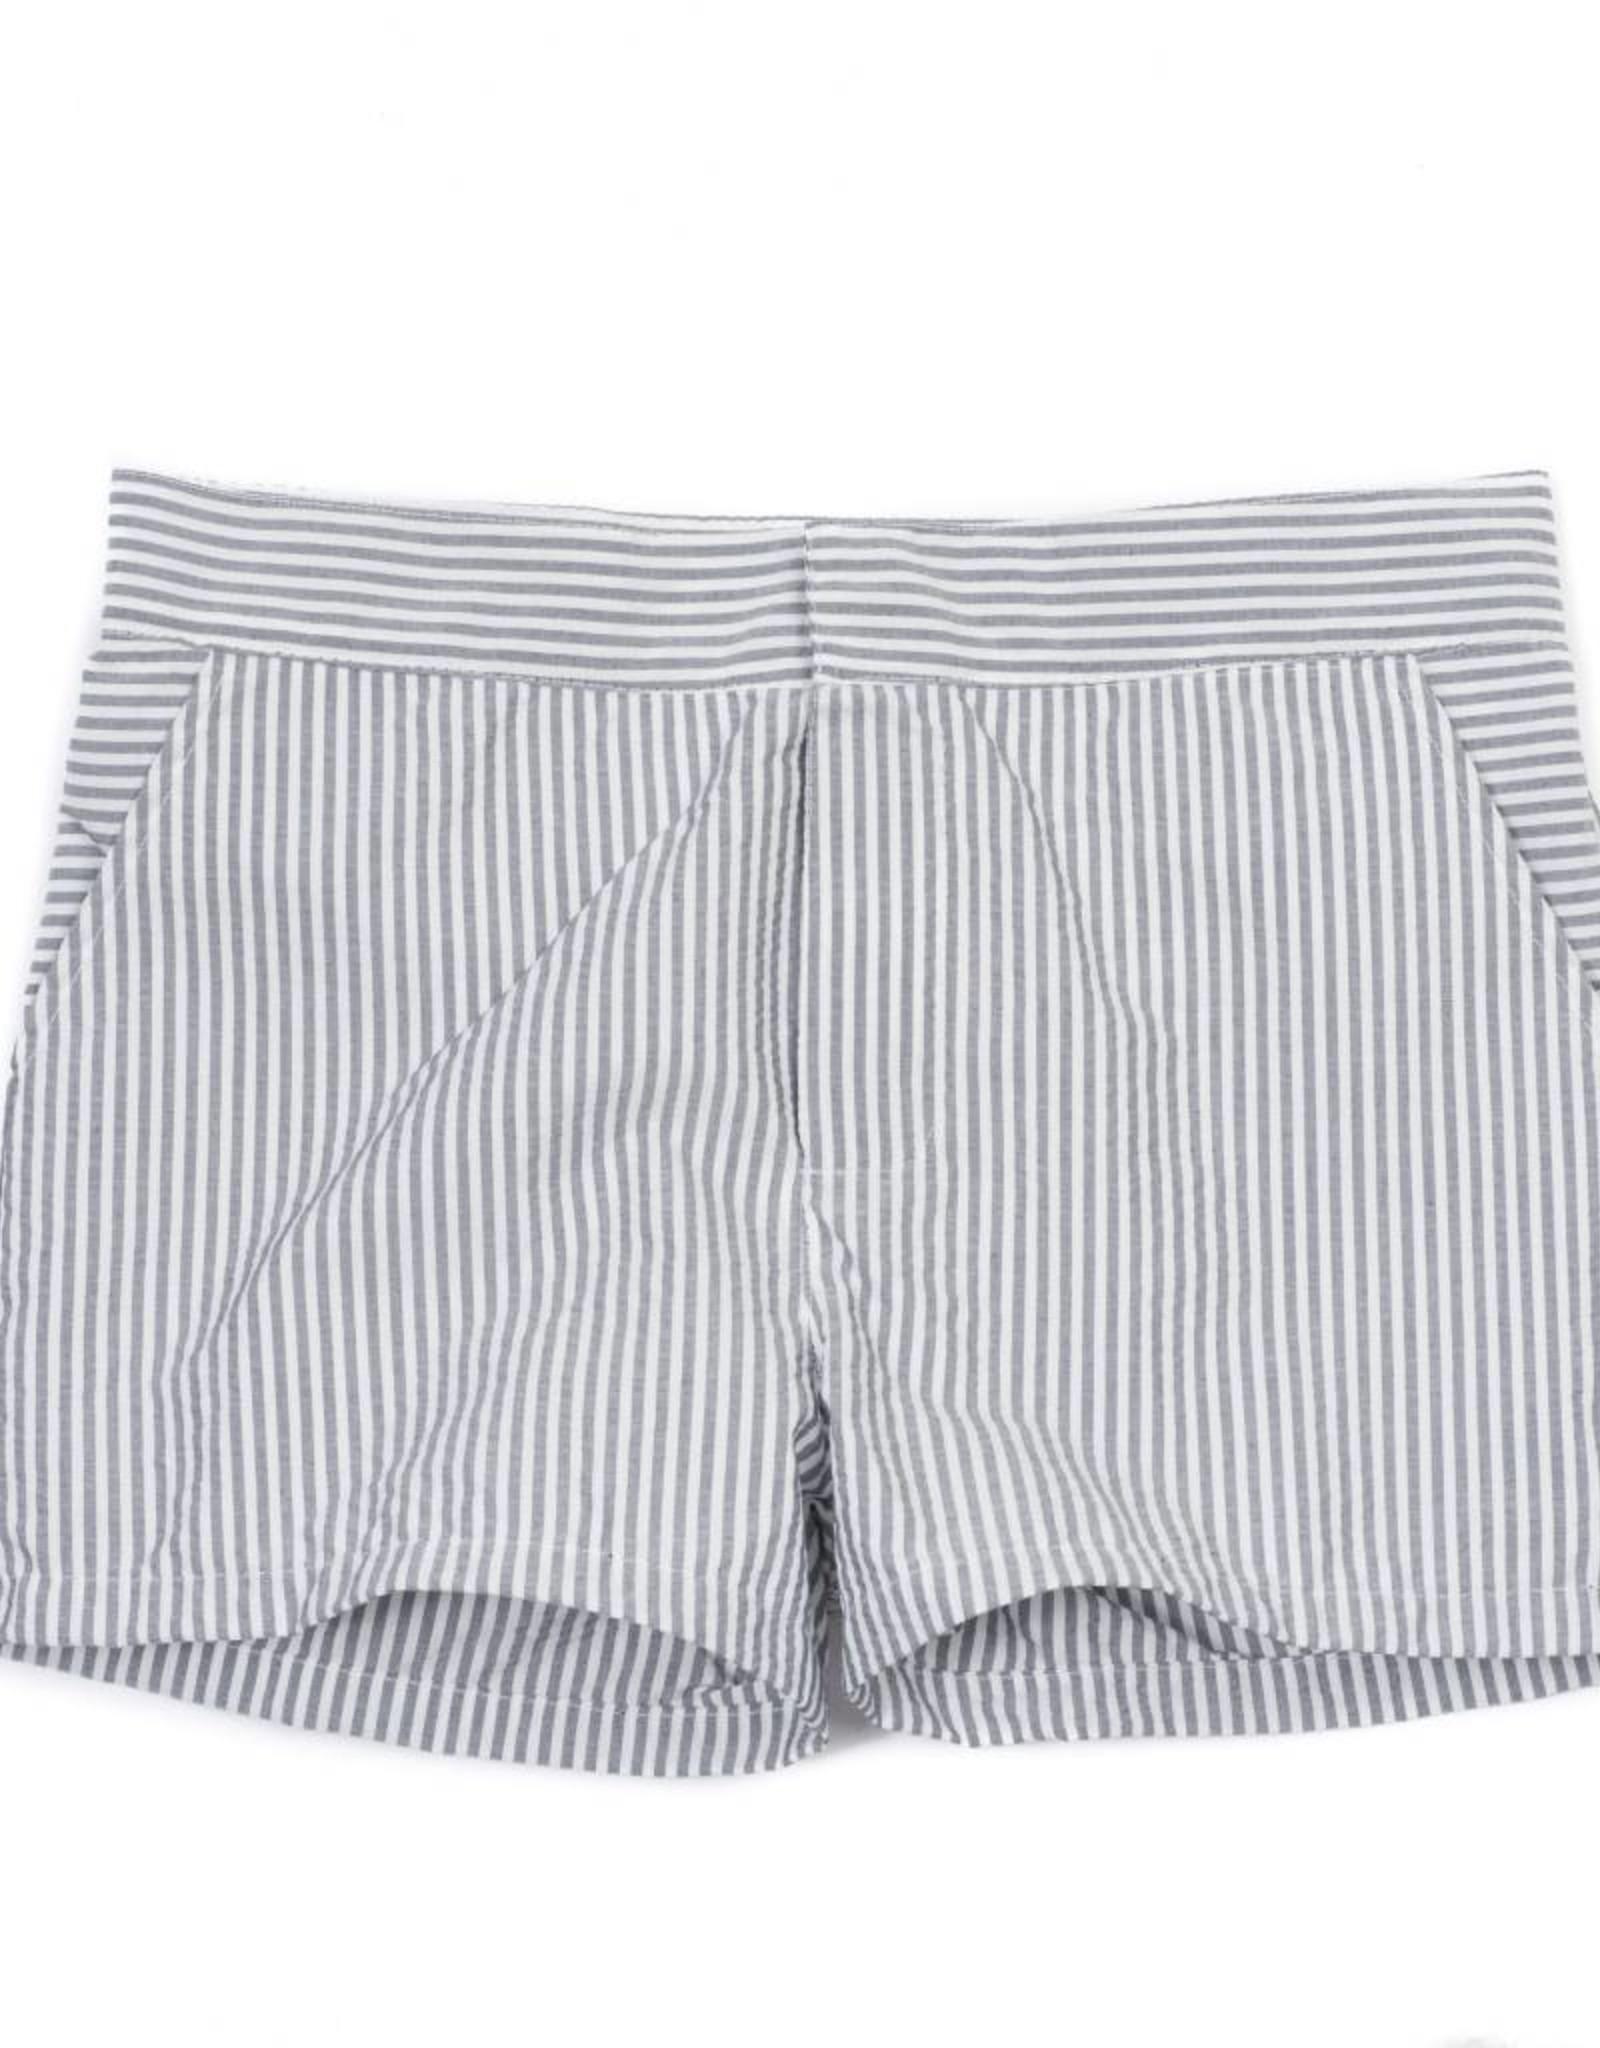 Bonton  Swim shorts, striped print